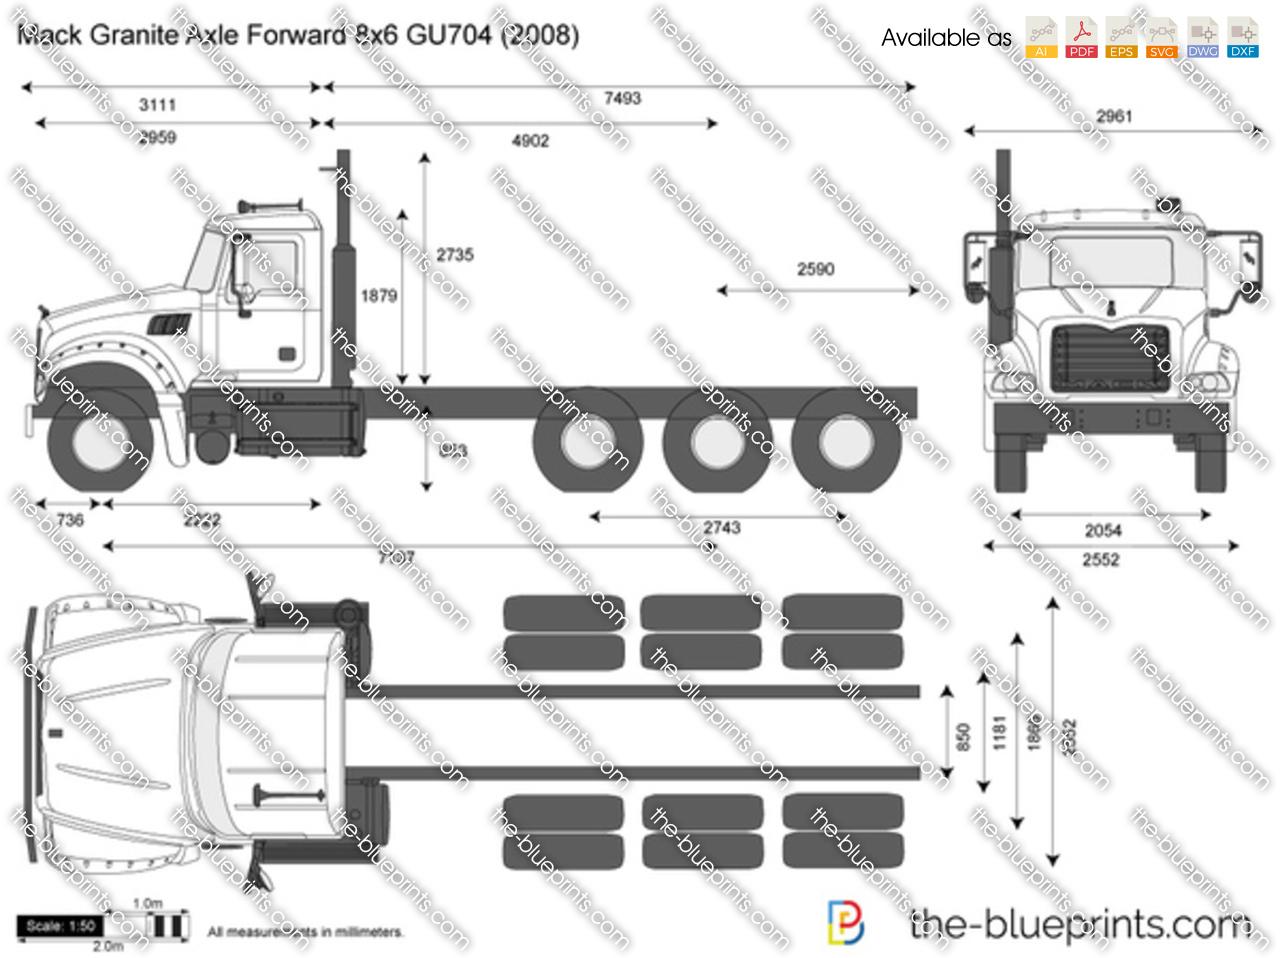 Mack Granite Axle Forward 8x6 GU704